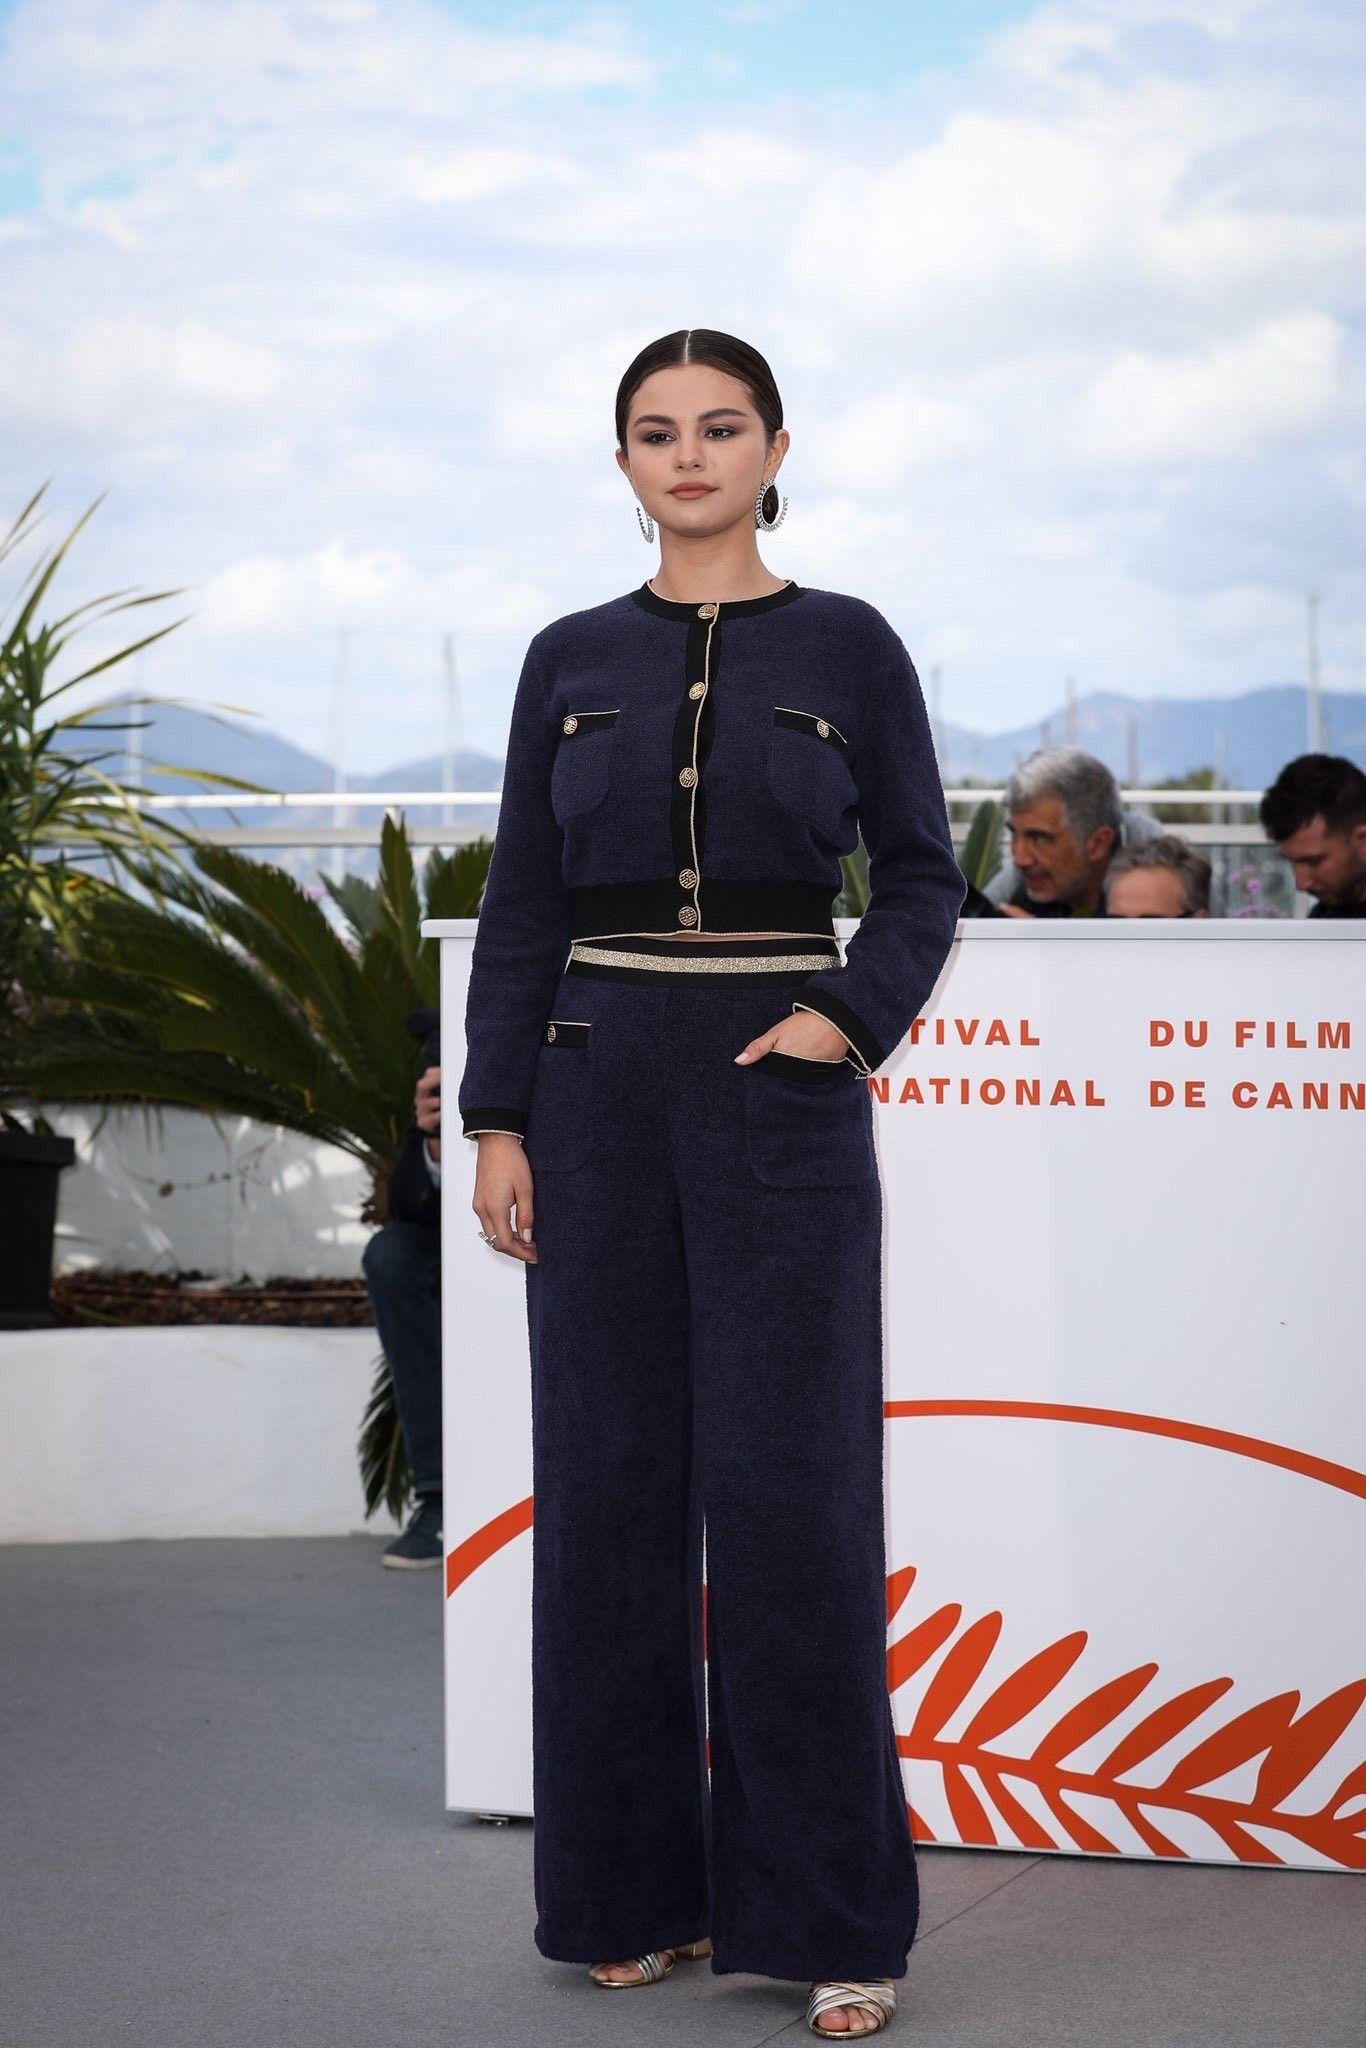 Selena Gomez Cannes 2019 Selena gomez latest, Selena